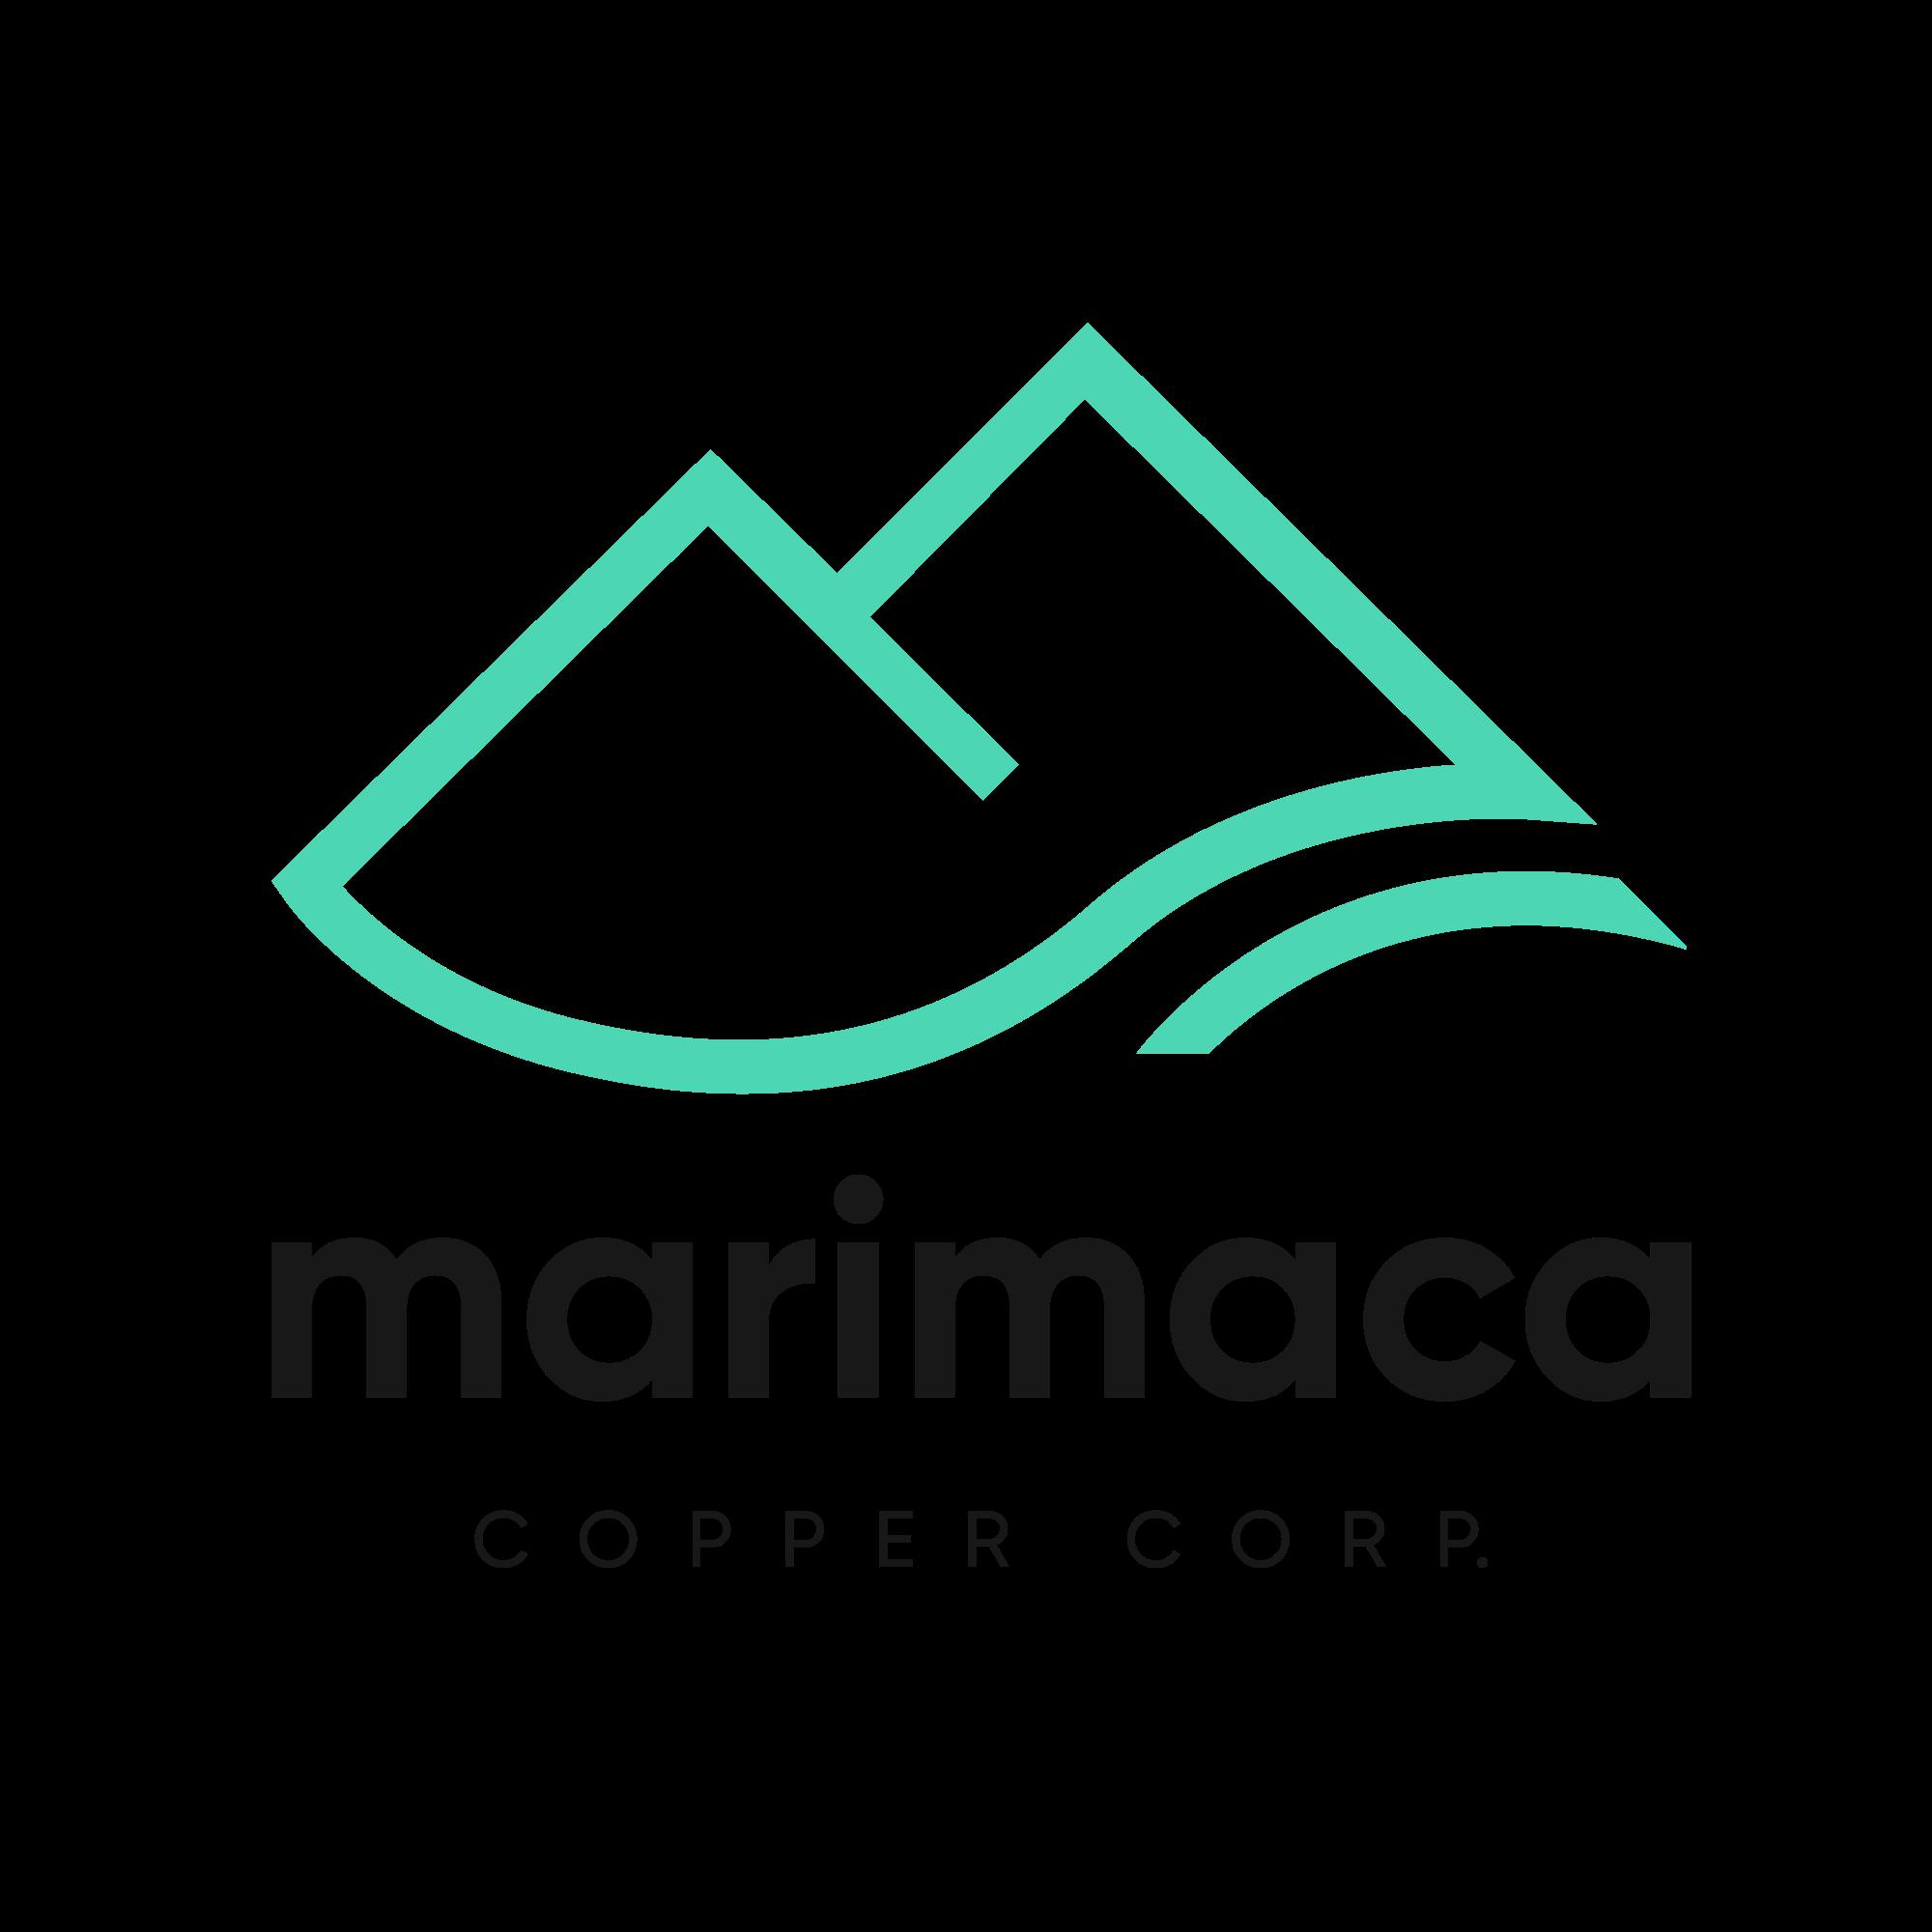 Marimaca Copper Receives Final Documentation for Upcoming Drilling Program